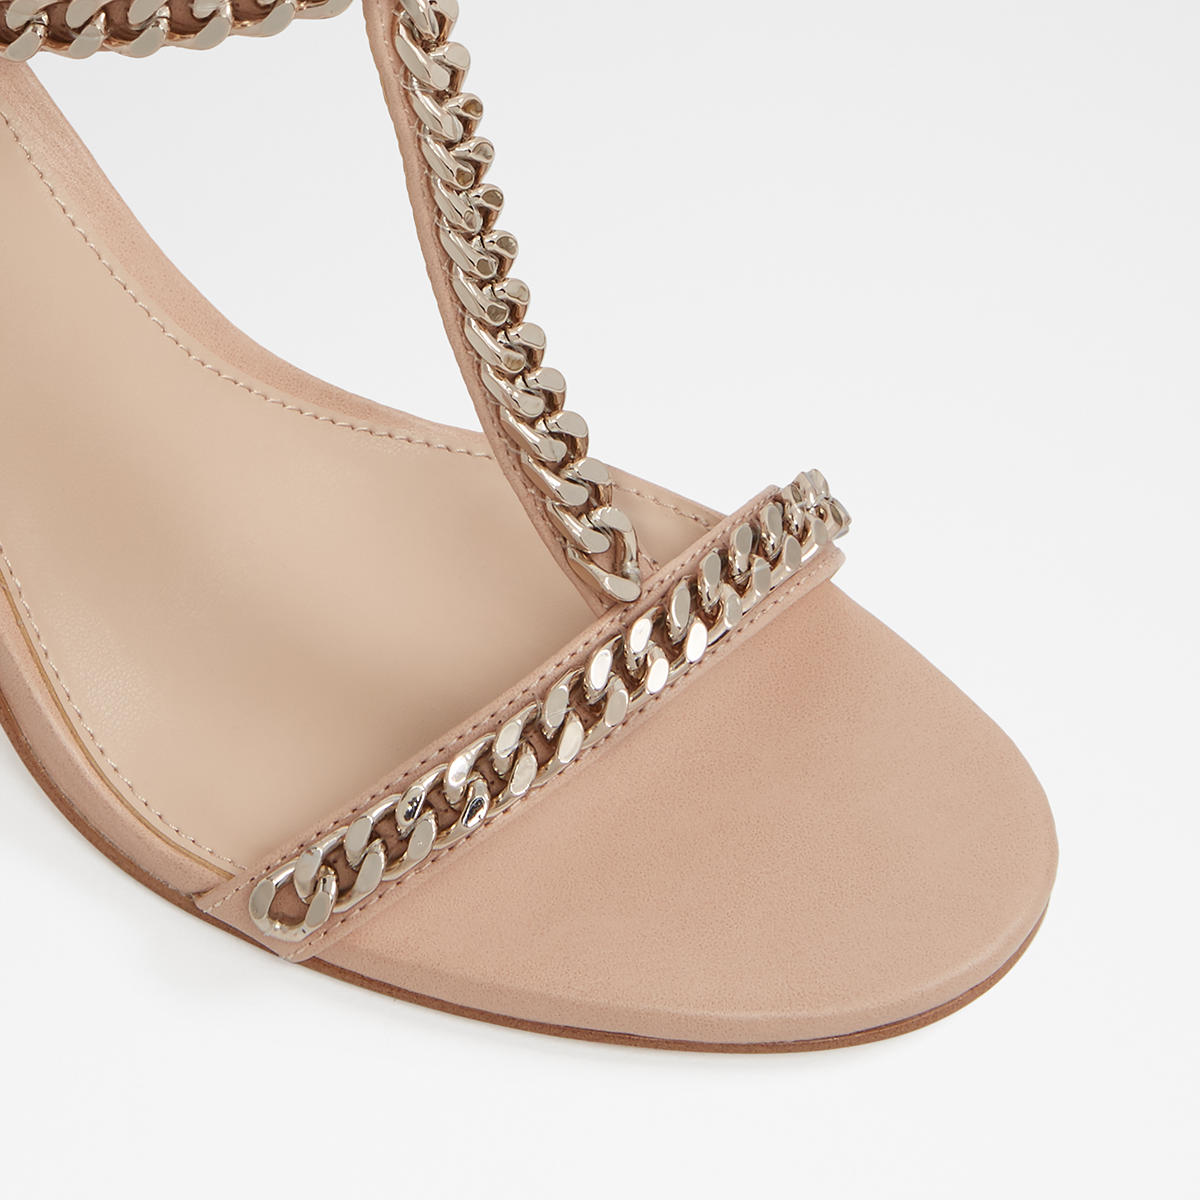 a6e188c058c Herrawia Bone Misc. Women s Low-mid heels